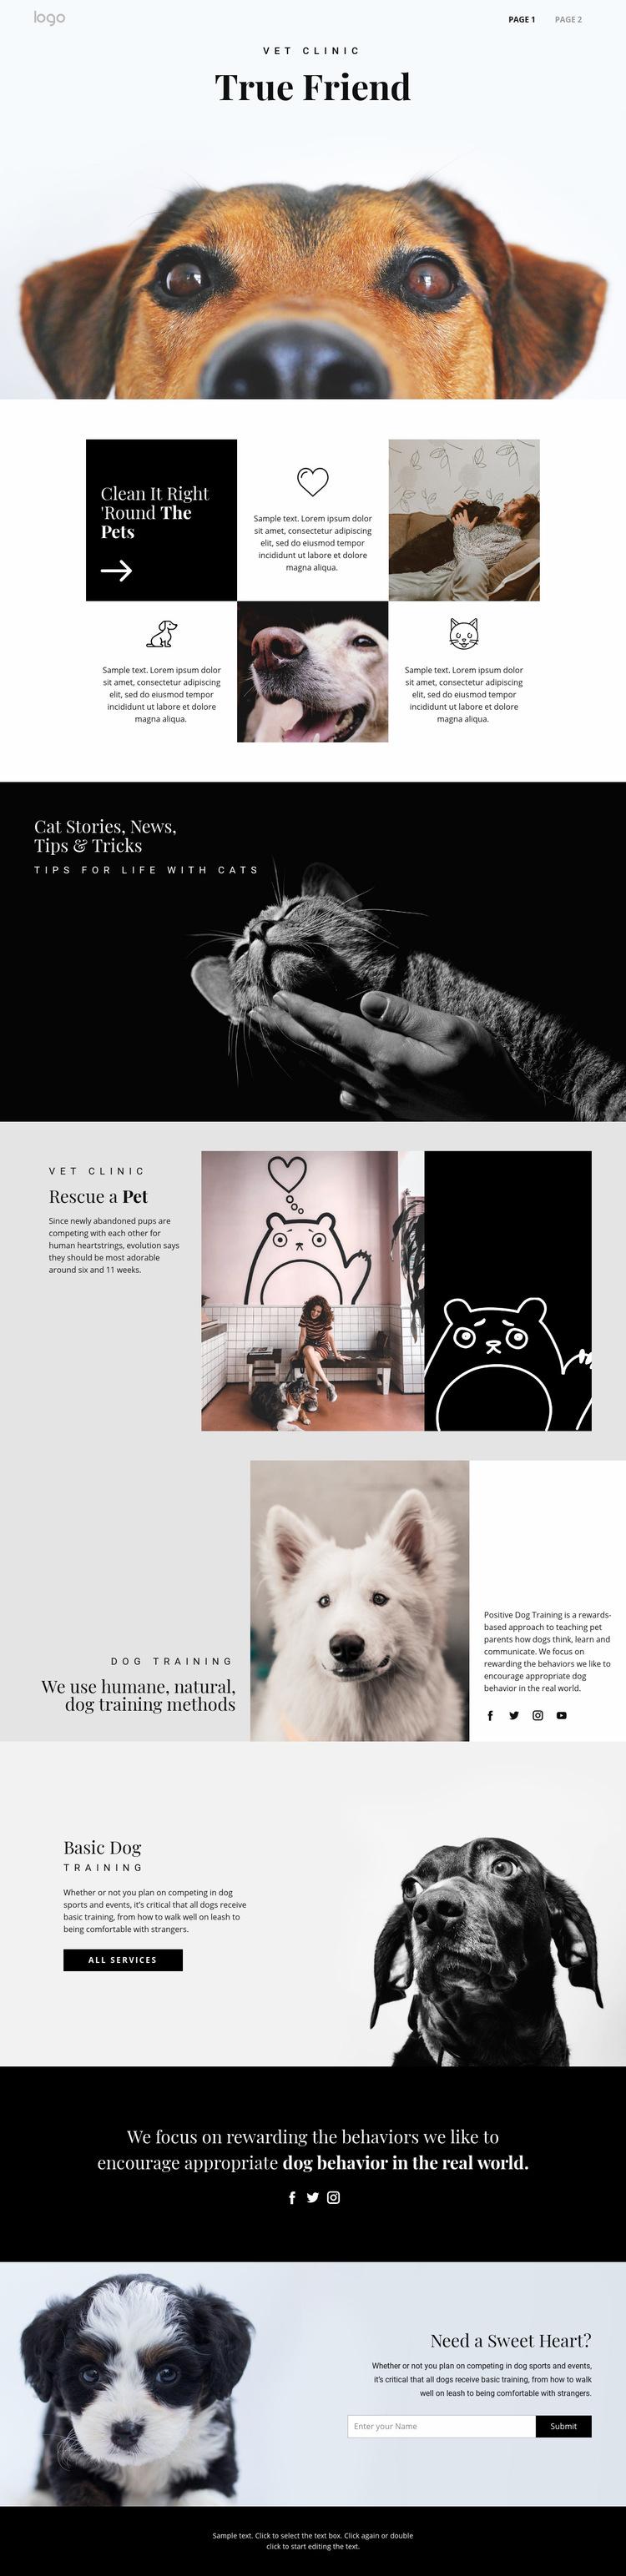 Finding your true friend pet Web Page Design